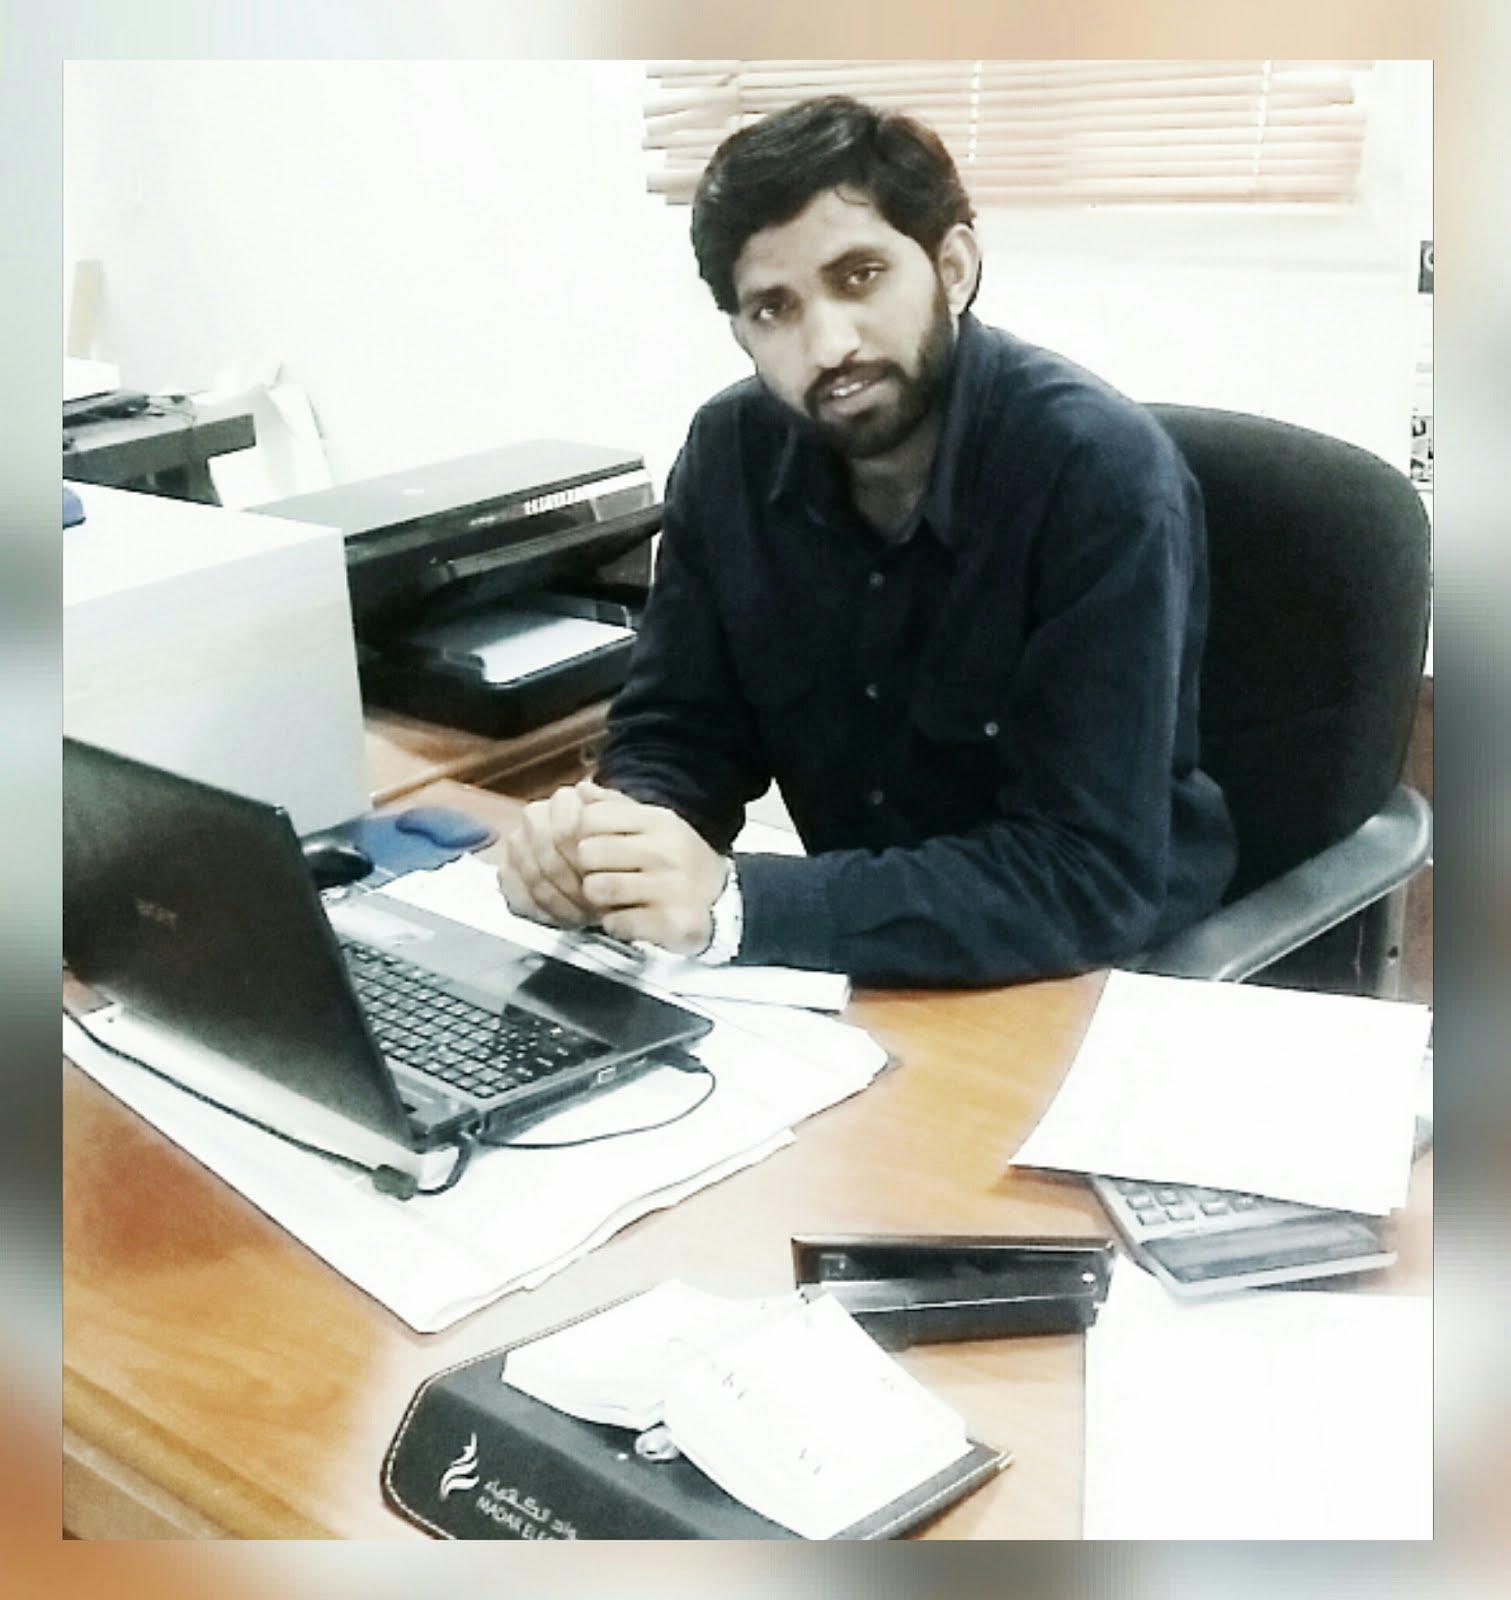 Saeed Ahmad Khokhar